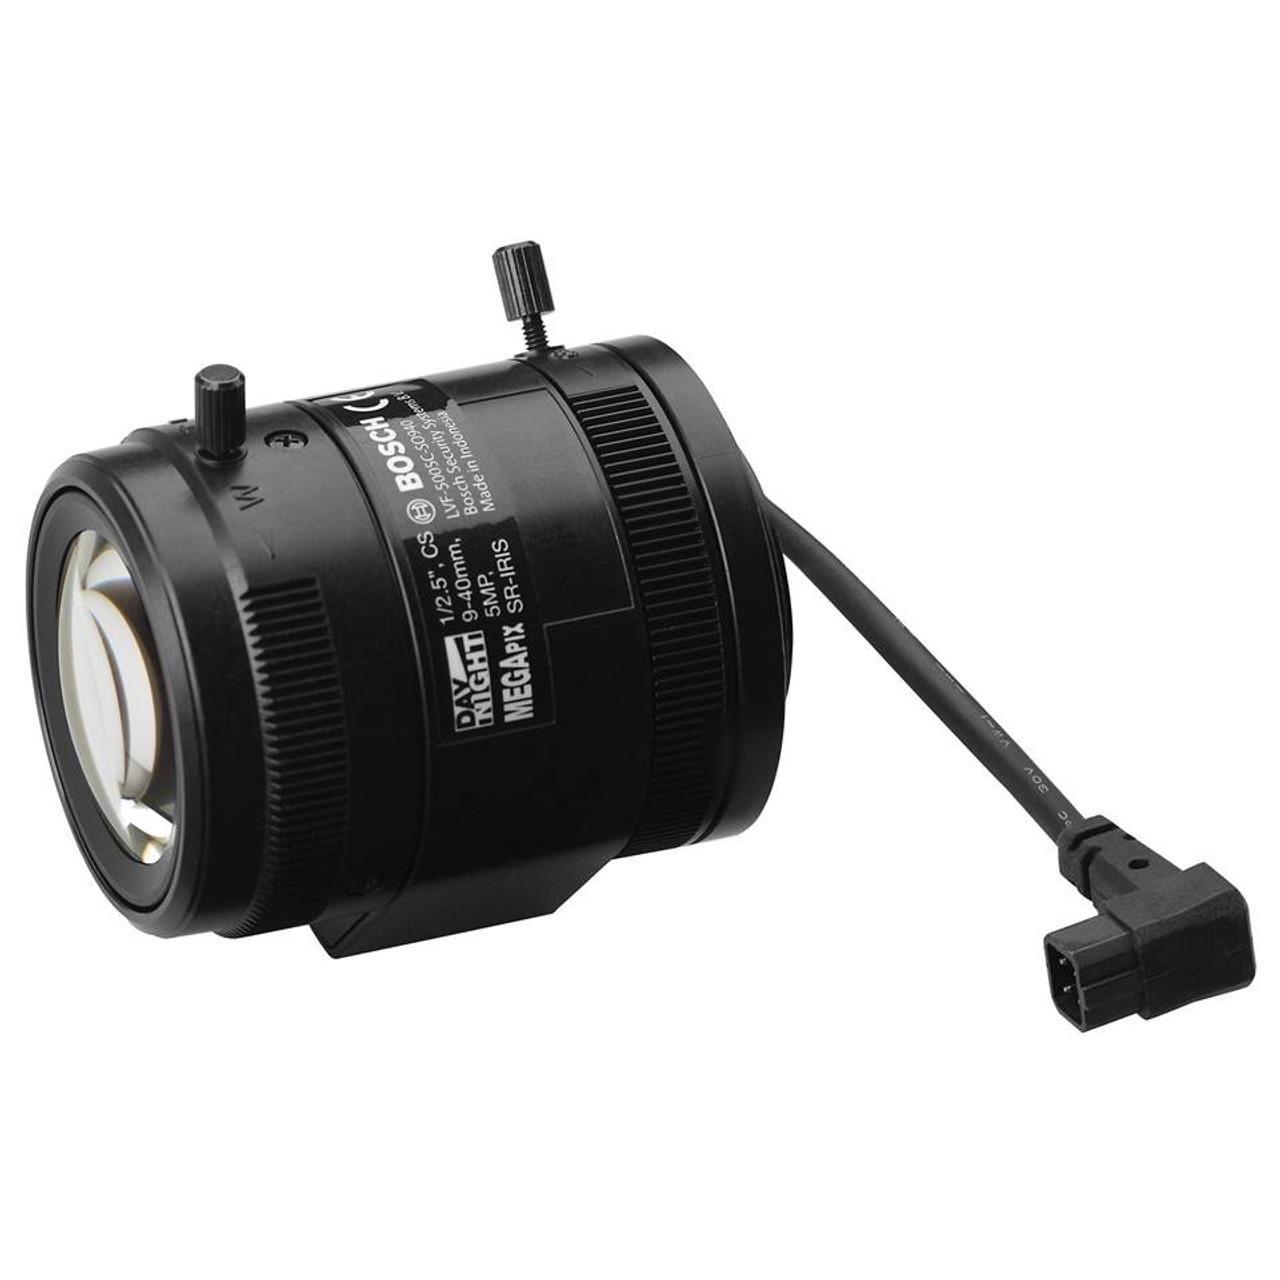 Bosch LVF-5005C-S4109 5Mp SR-Iris Varifocal IR Lens 4.1-9mm